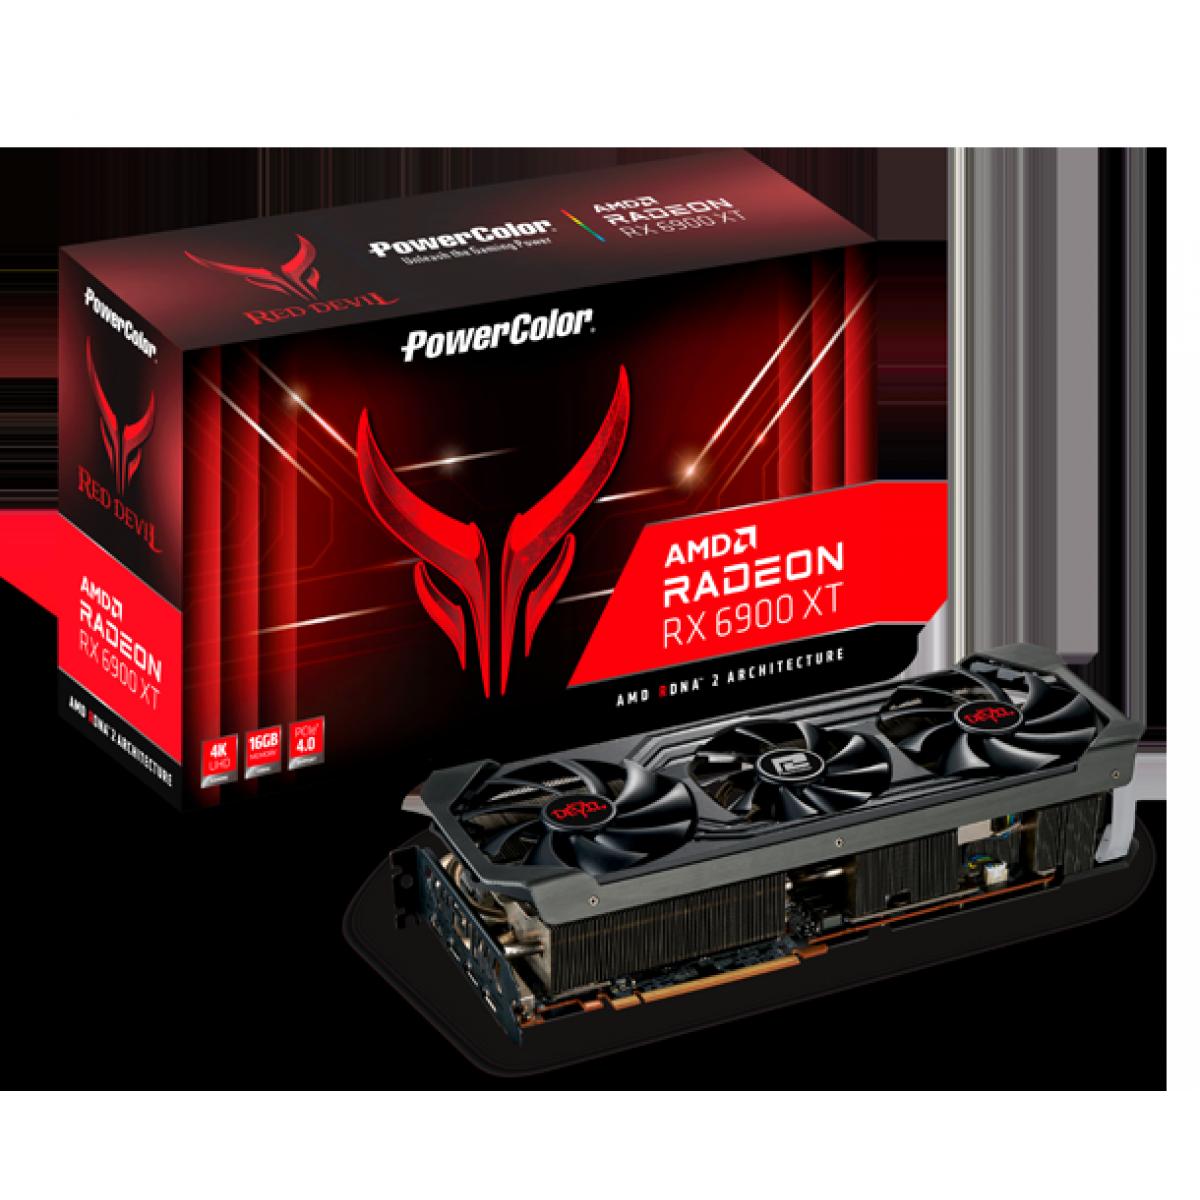 Kit Upgrade PowerColor Radeon RX 6900 XT Red Devil + AMD Ryzen 7 5800X + Brinde Jogo Dirt 5